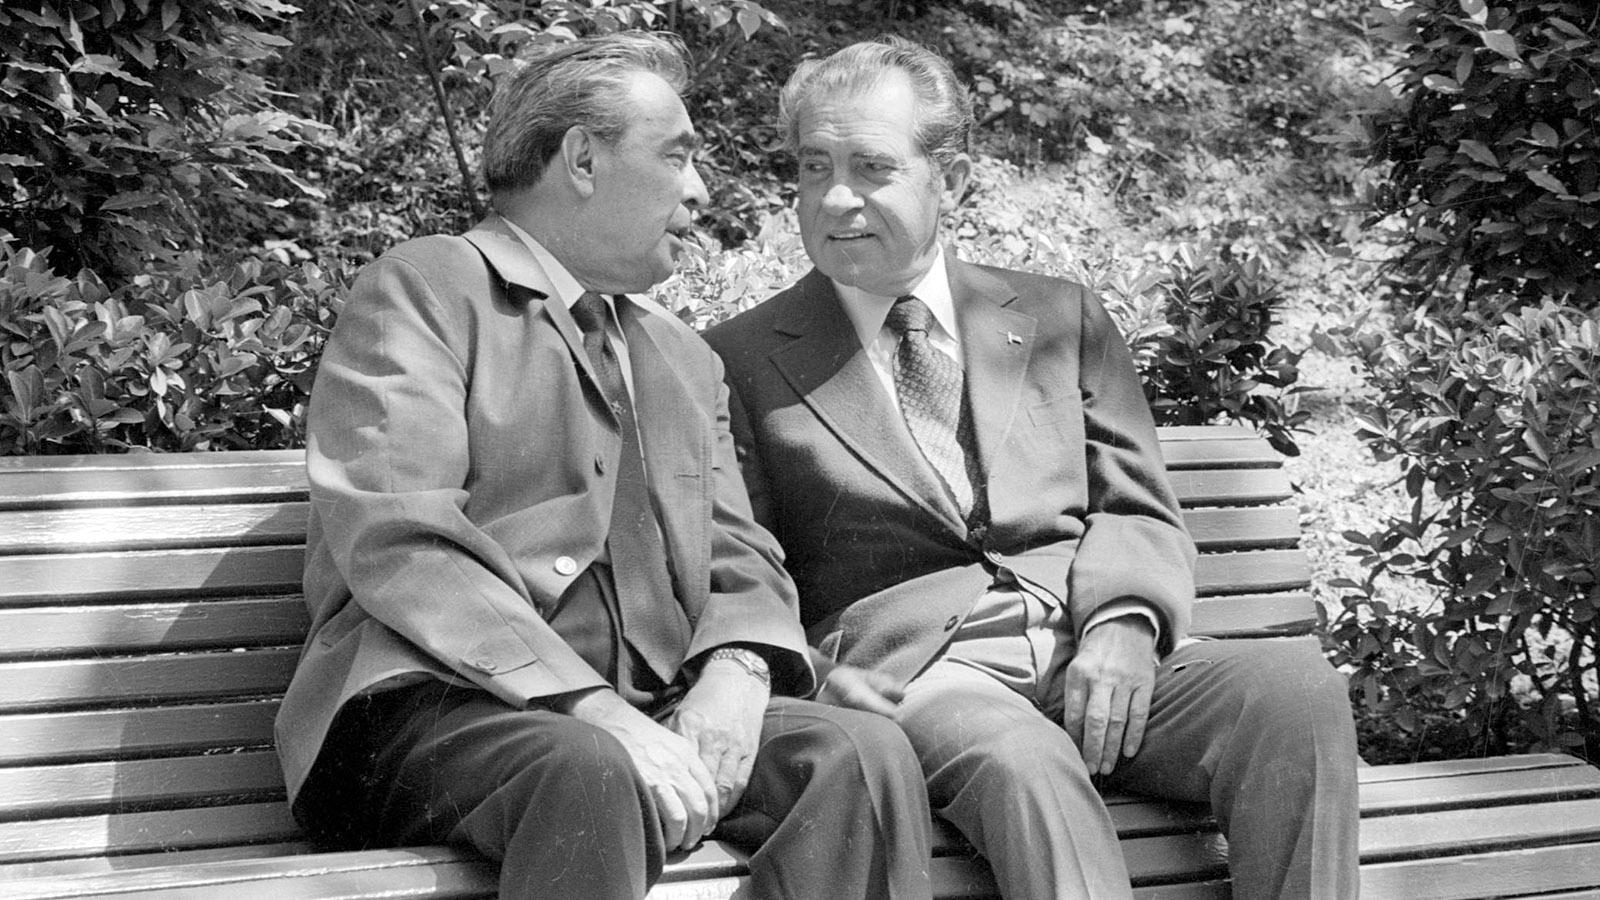 1972 год. Визит в СССР президента США Ричарда Никсона